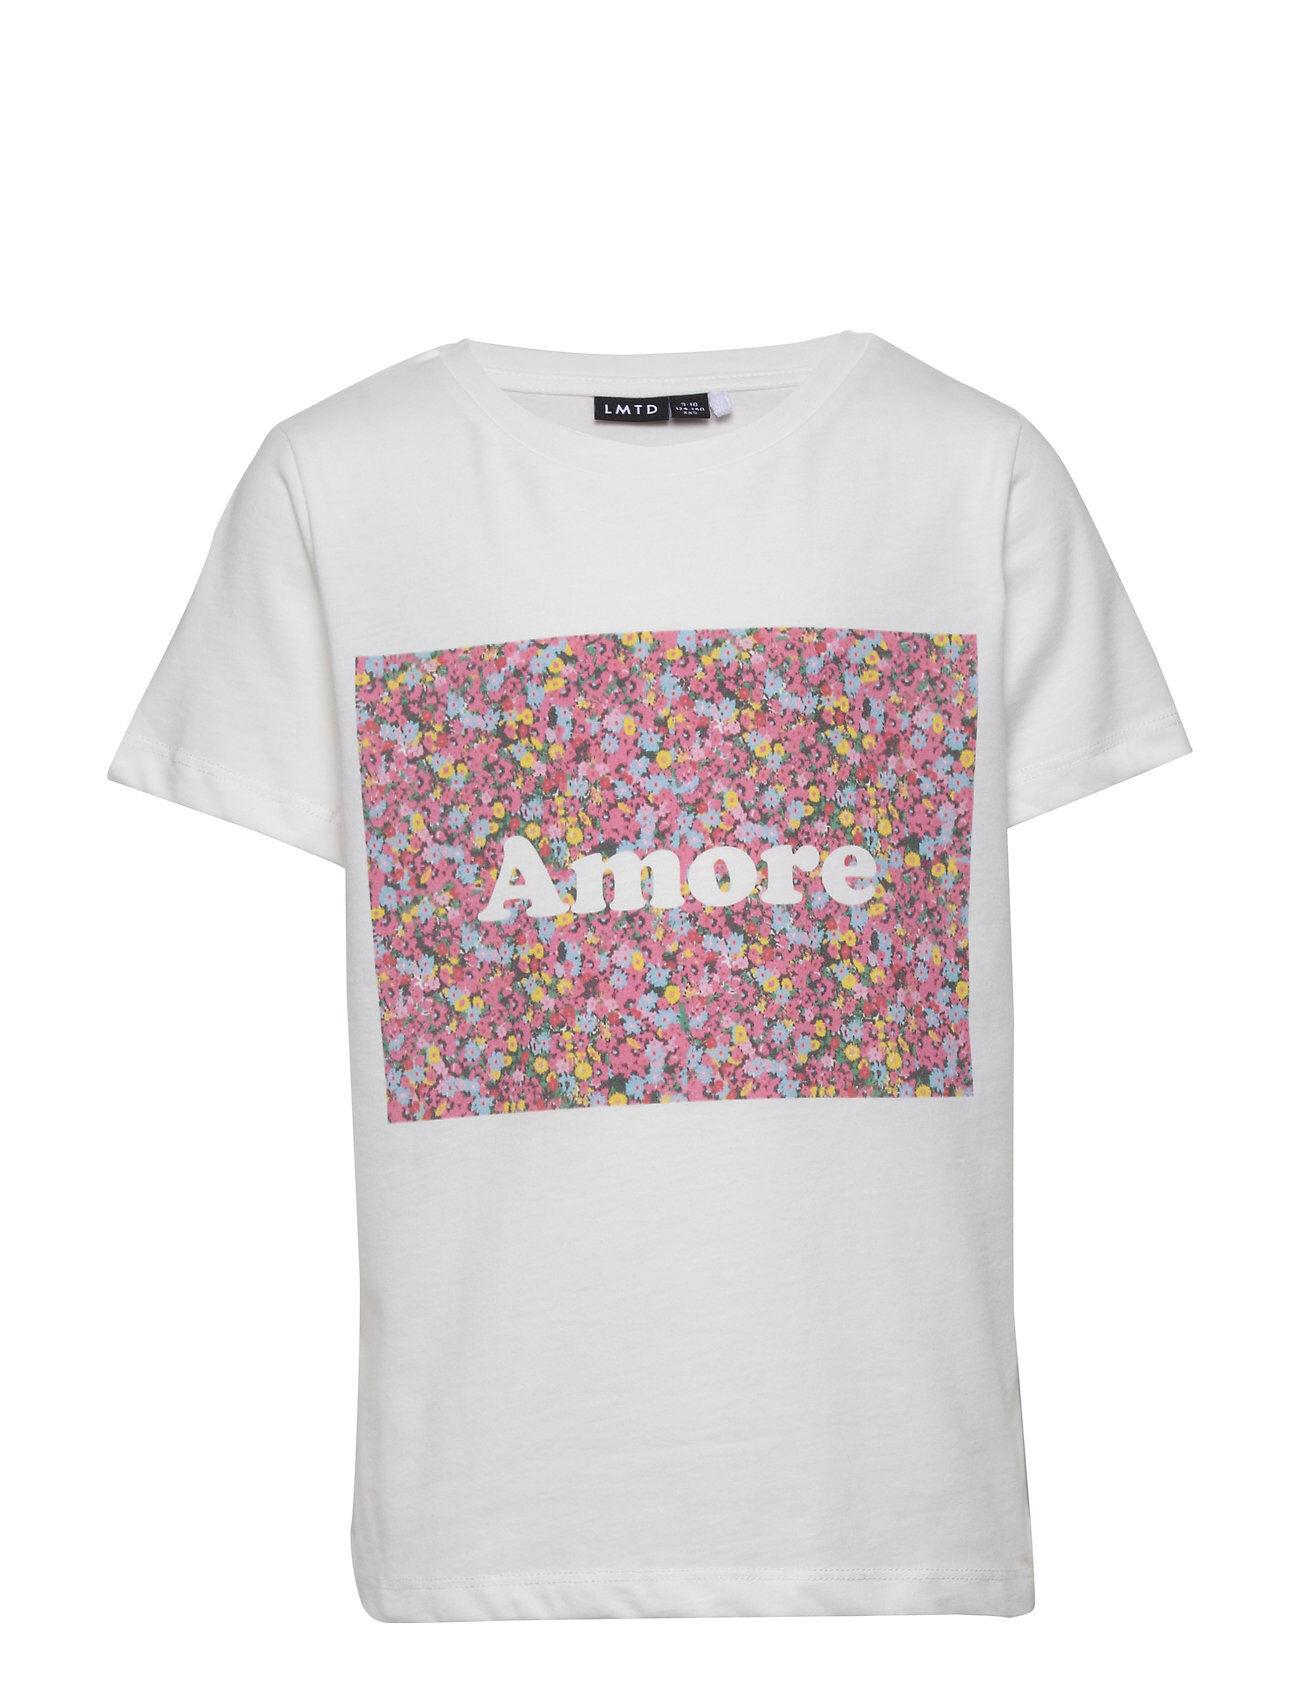 LMTD Nlfkety Ss R Top T-shirts Short-sleeved Valkoinen LMTD